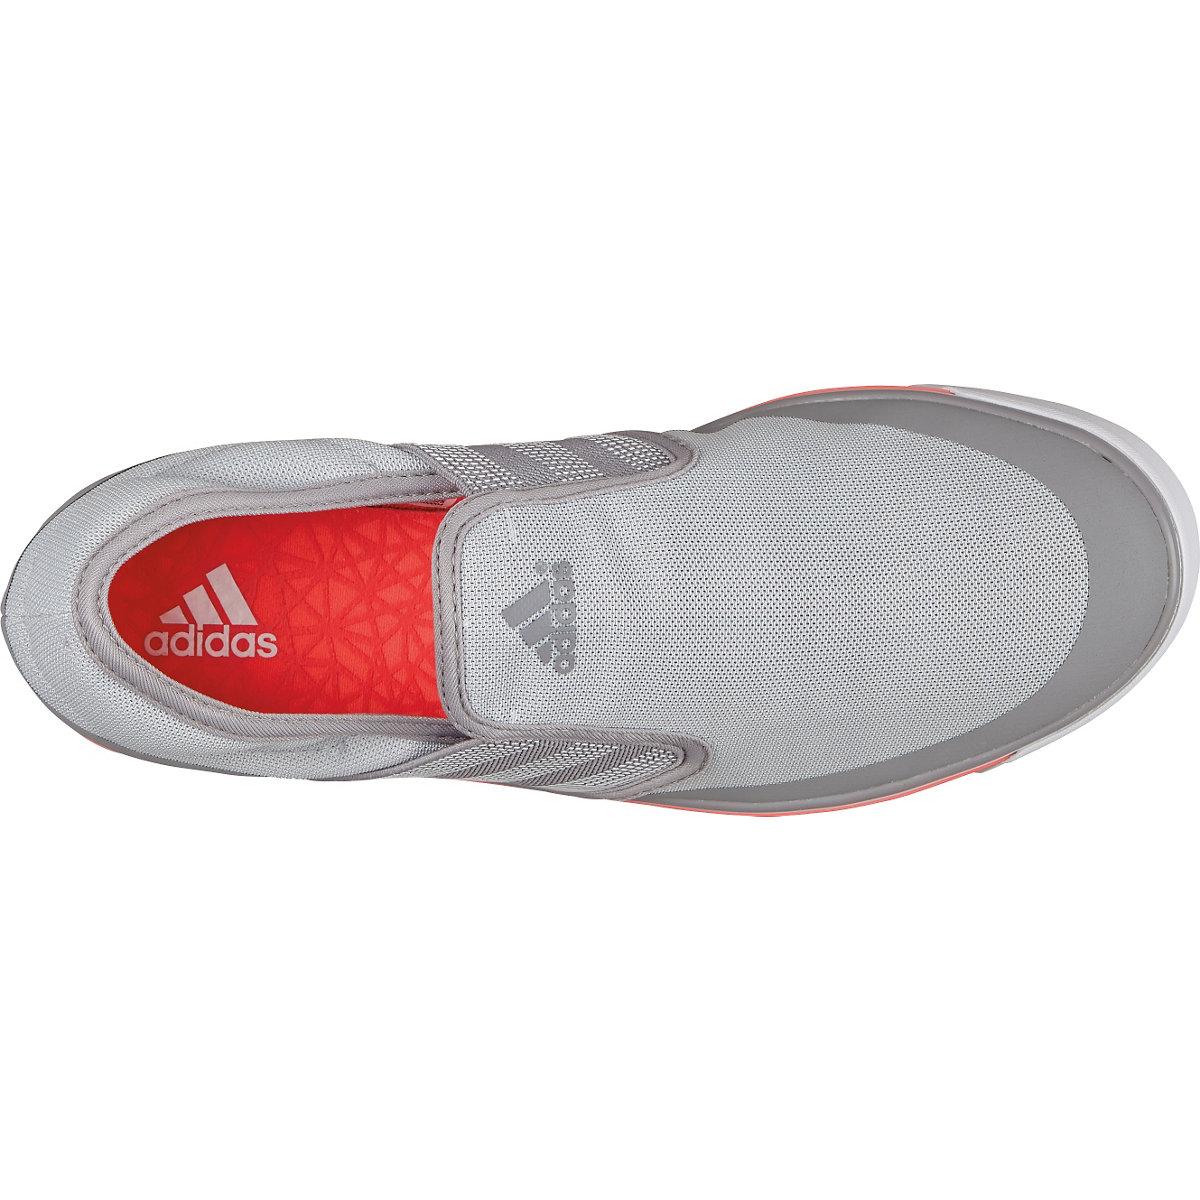 Adidas Adicross Sl